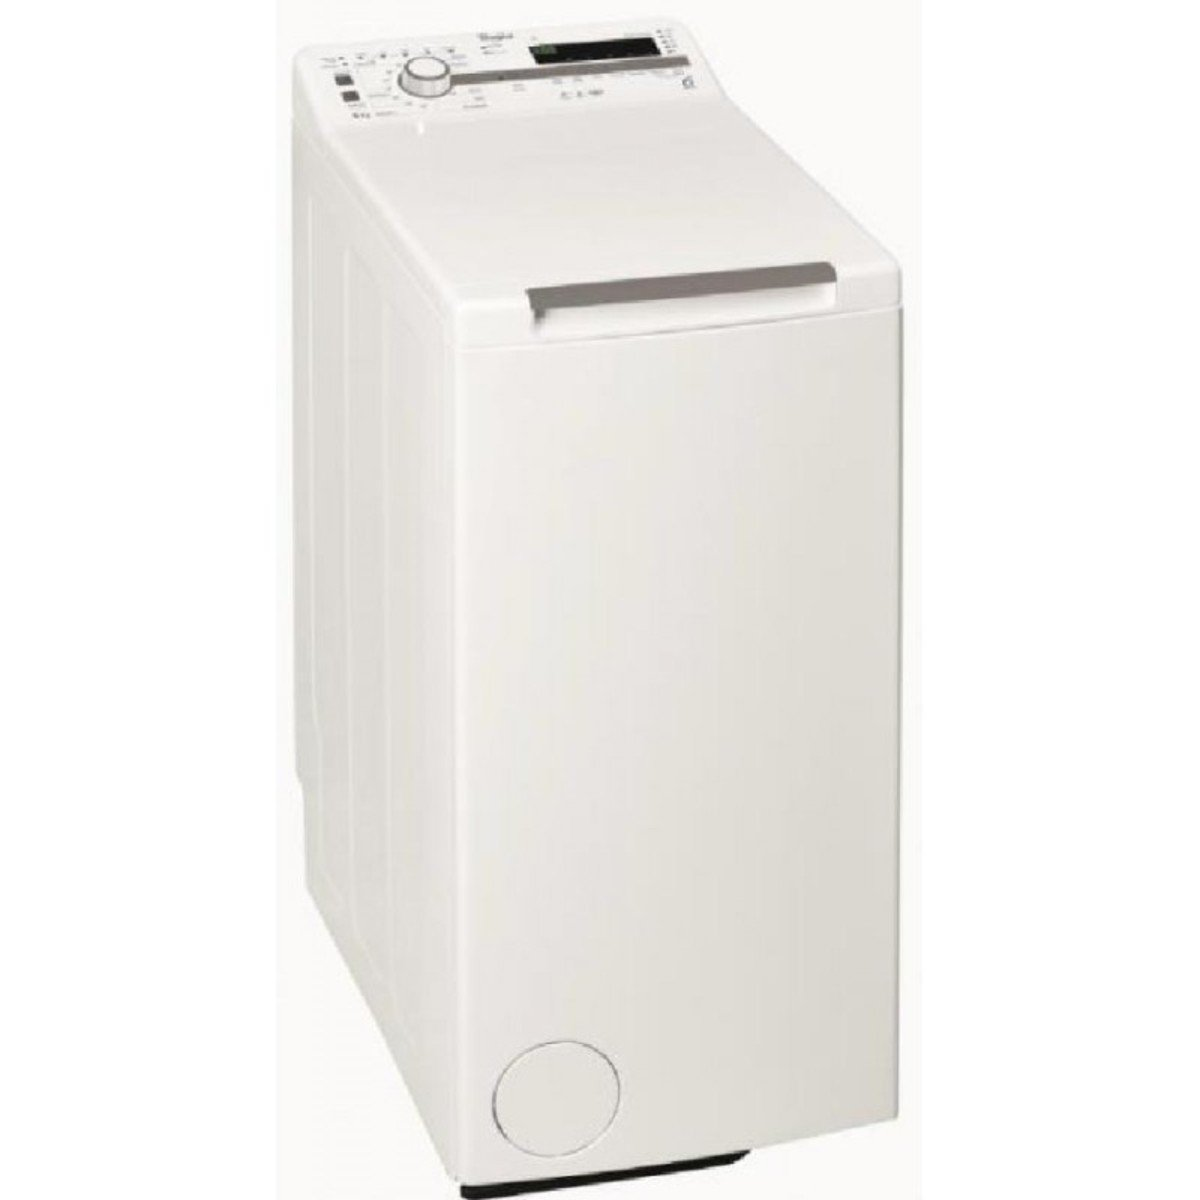 TDLR70810 7.0kg 850rpm 頂揭式洗衣機